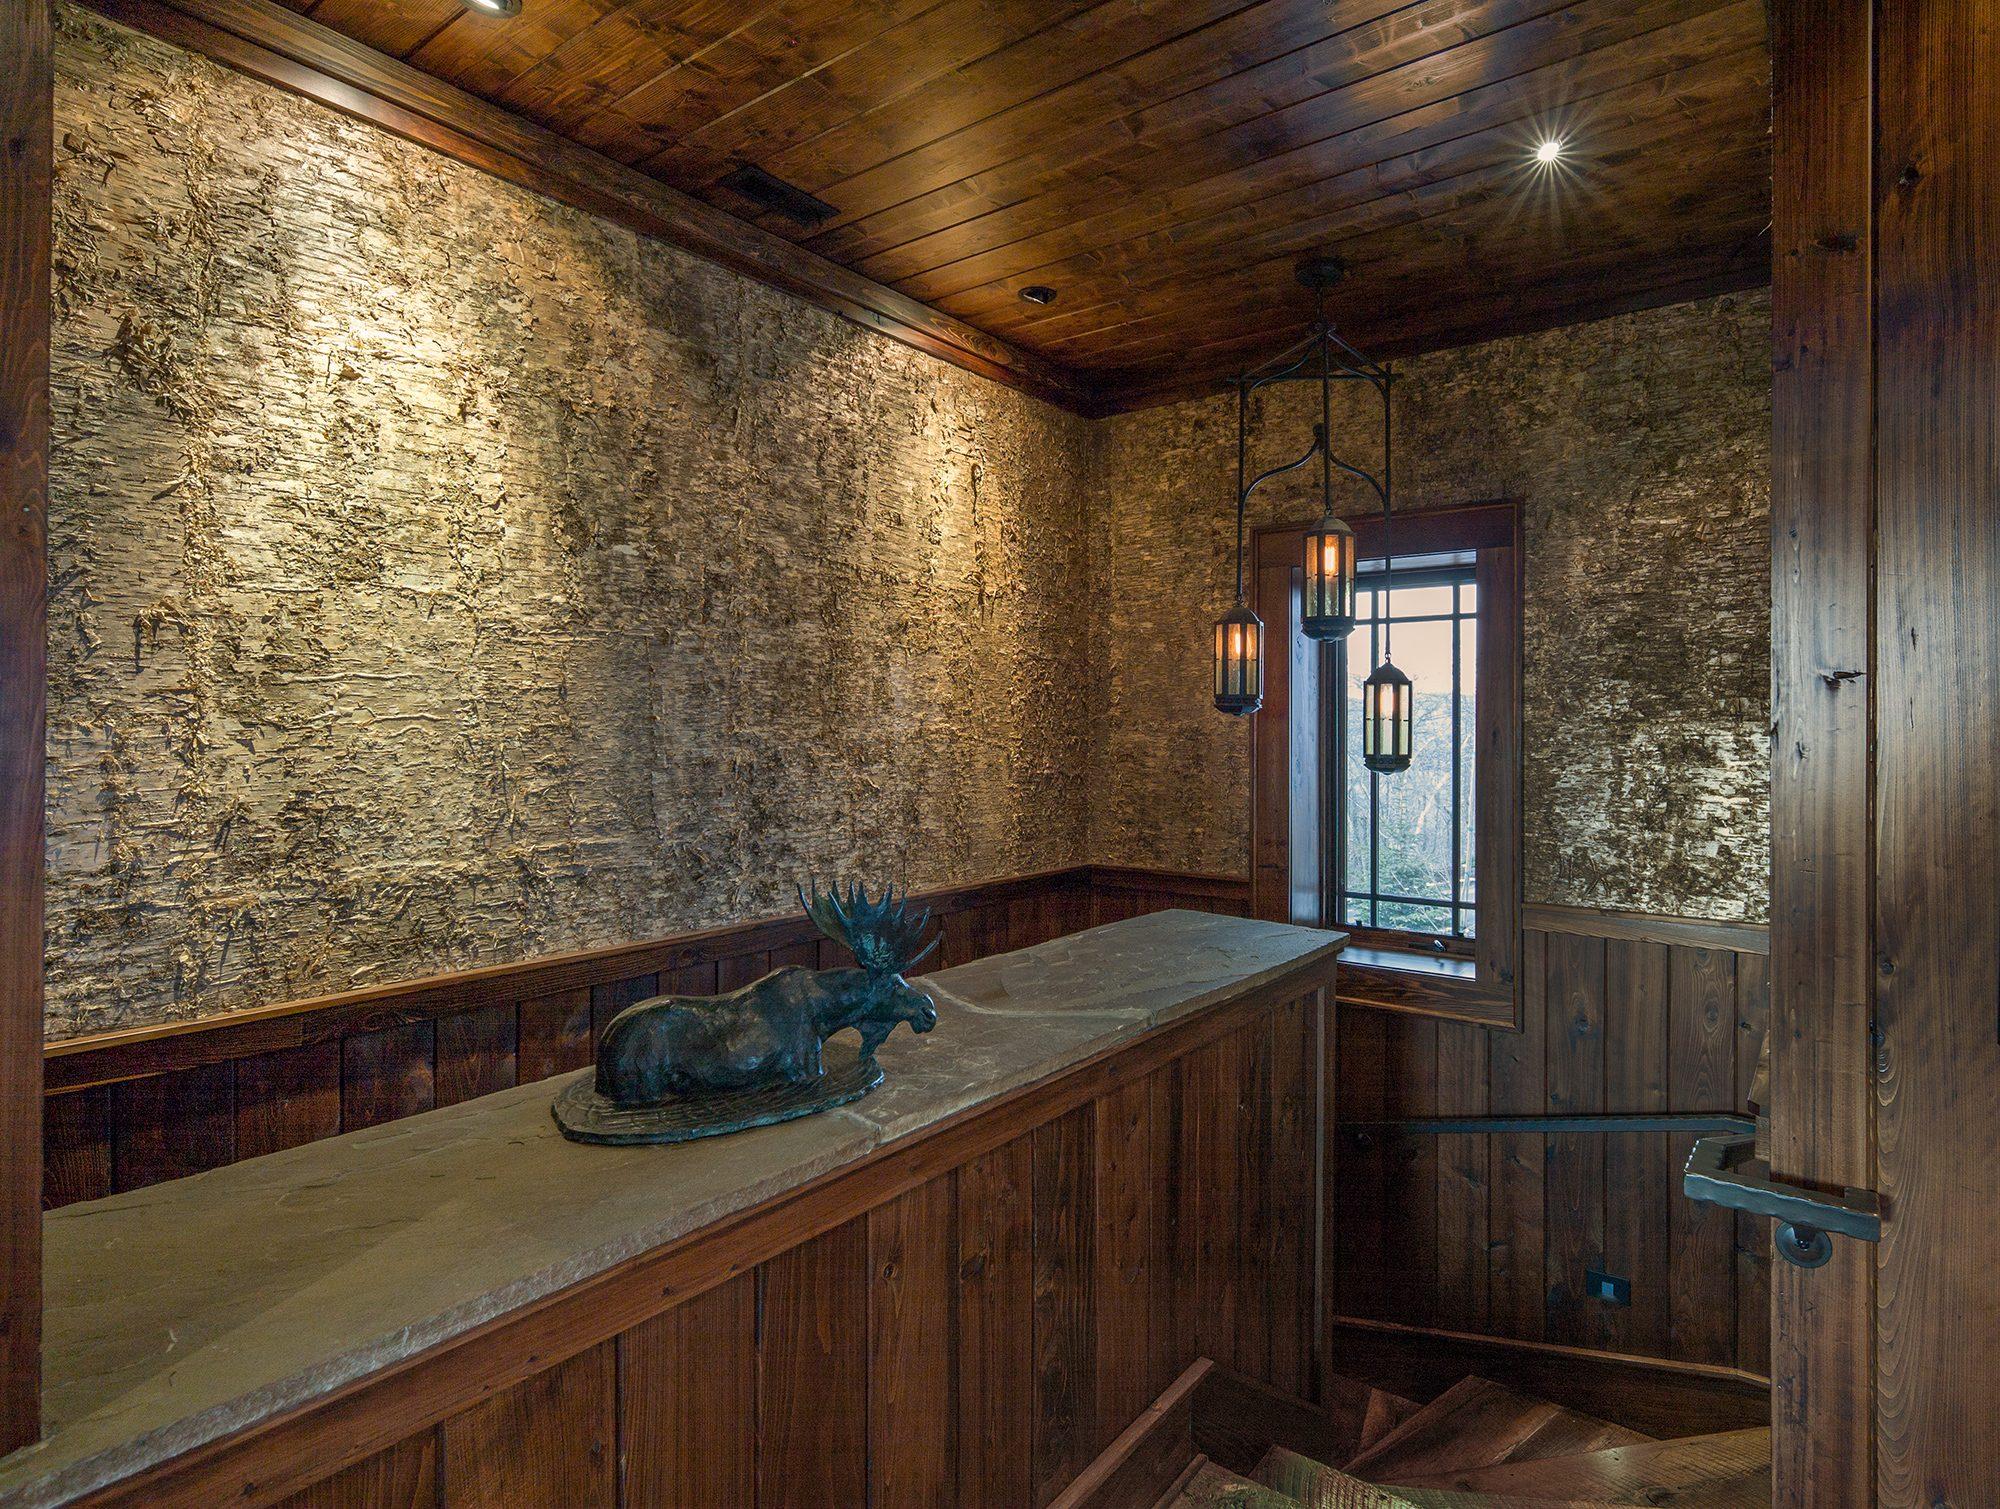 Gold Birch Bark Laminate Wall Covering